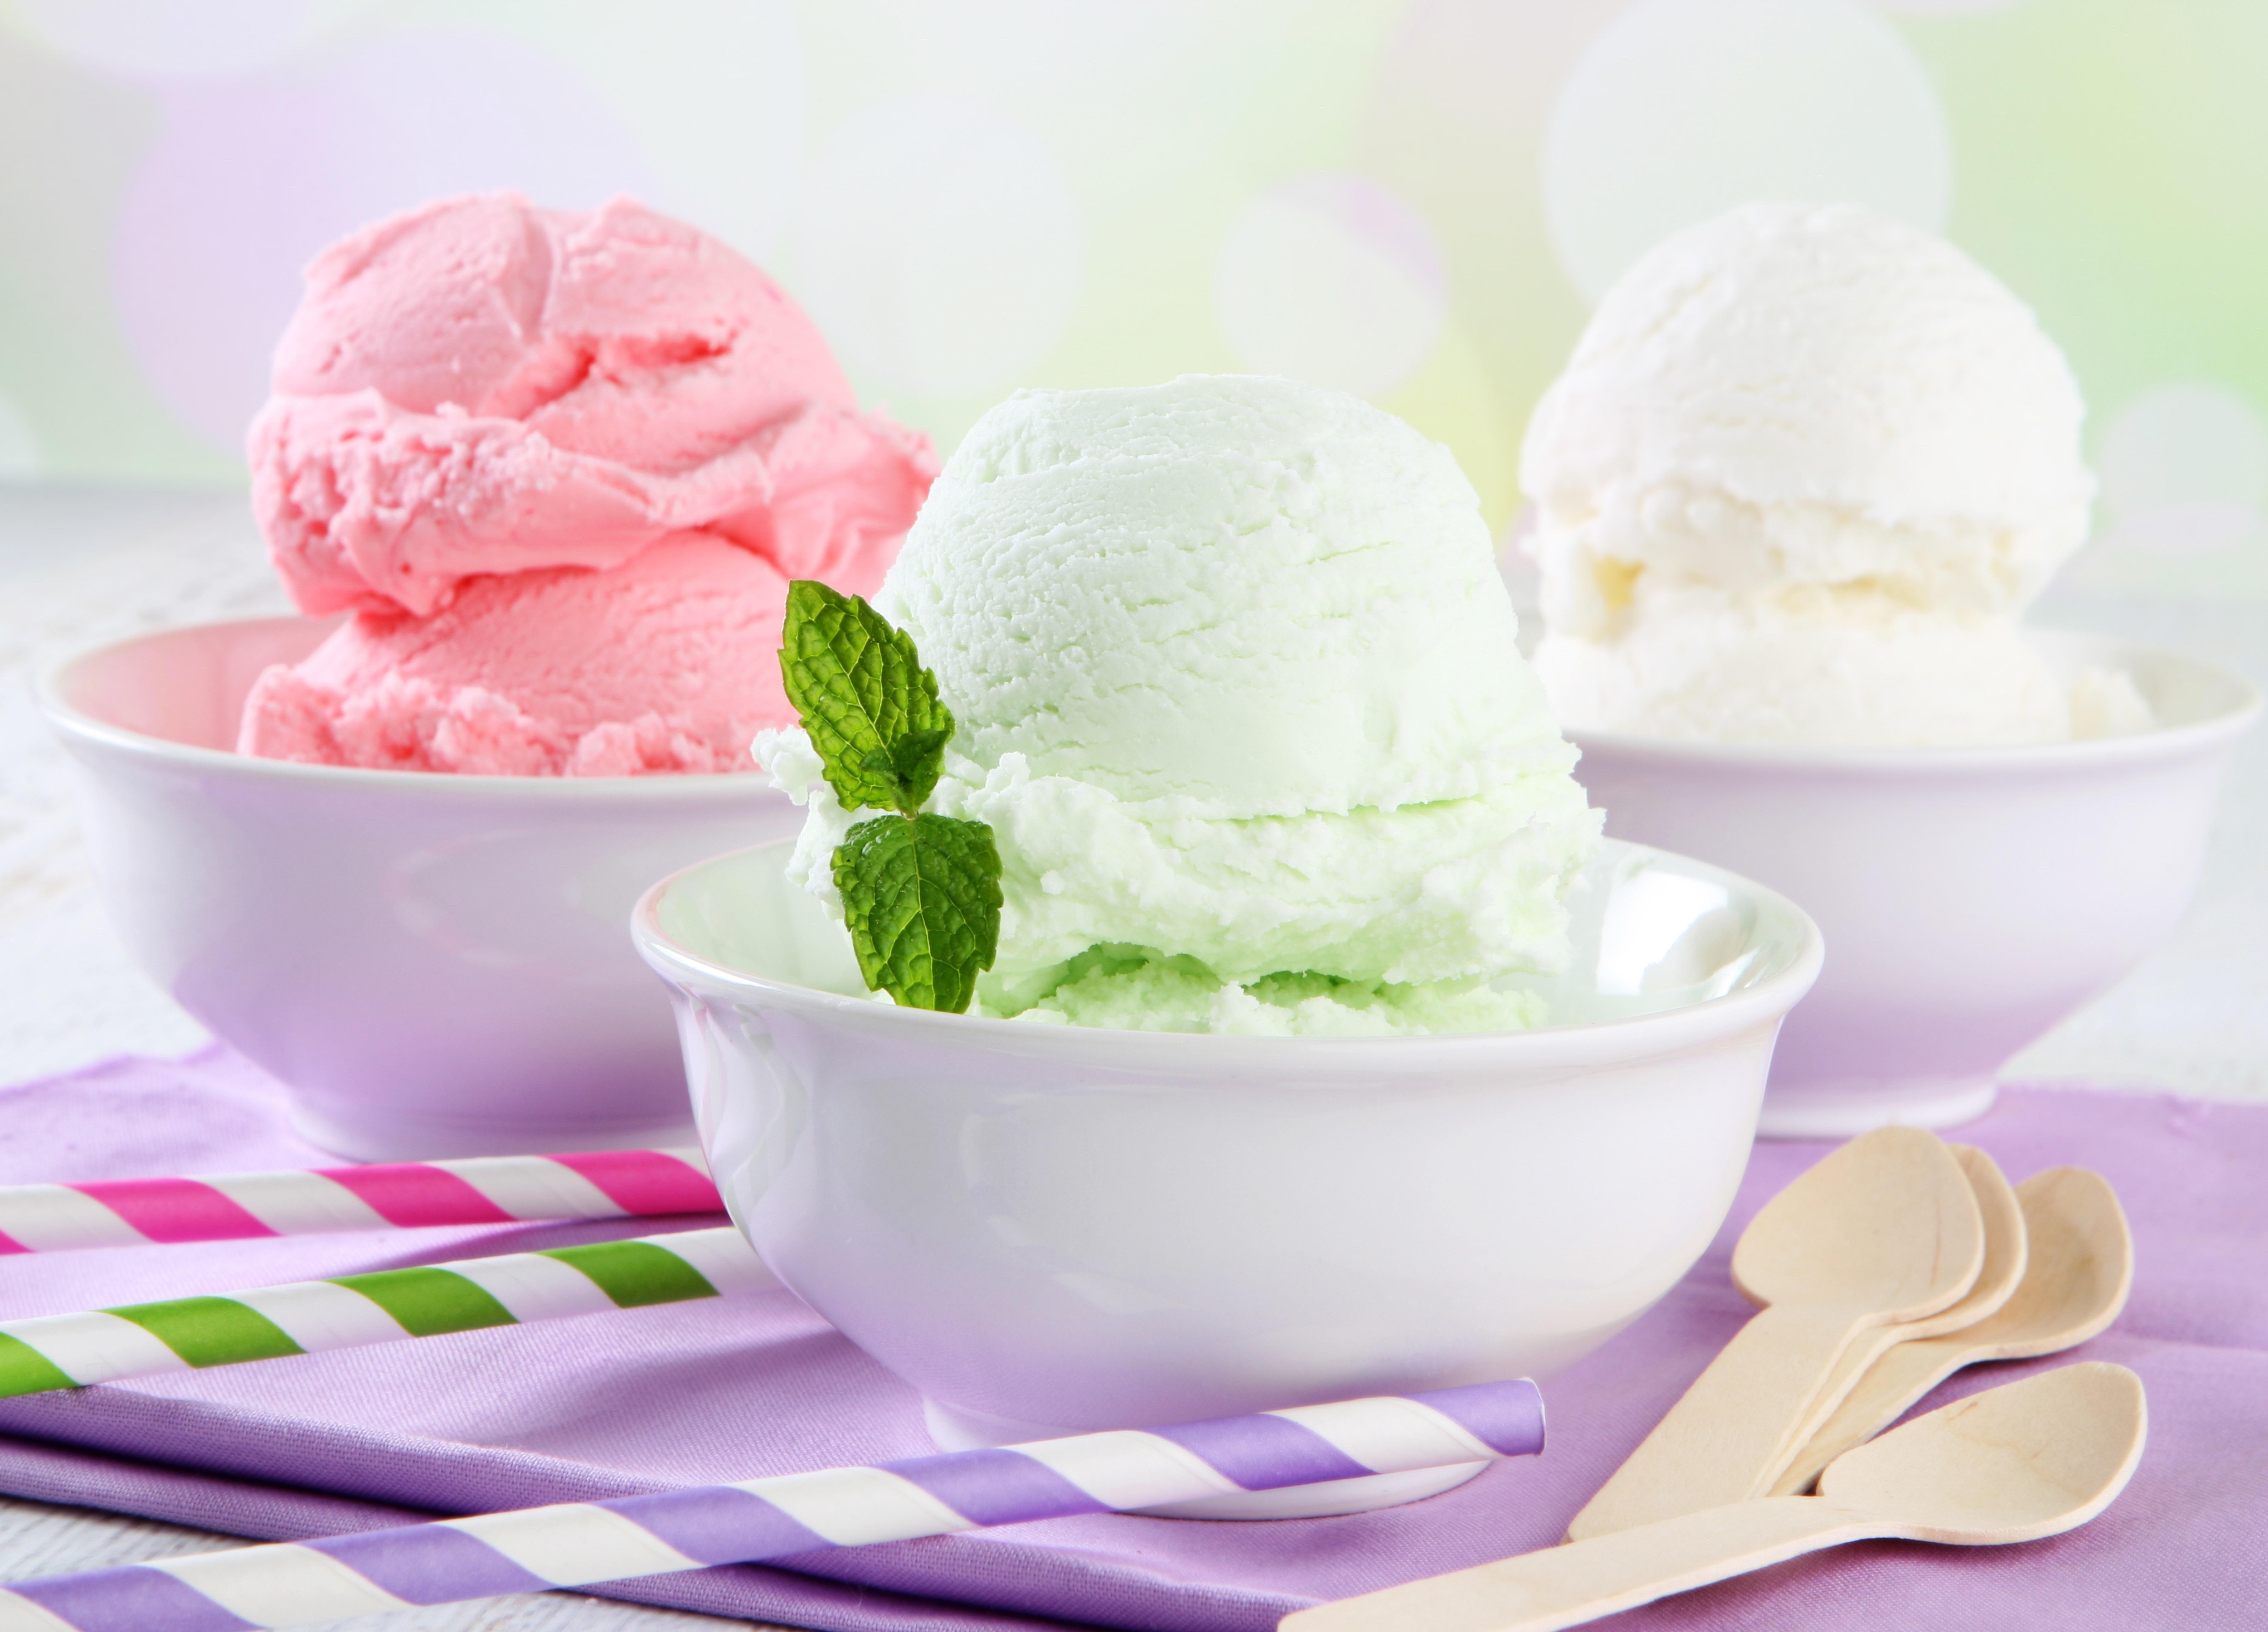 мороженое шариками фото каприо